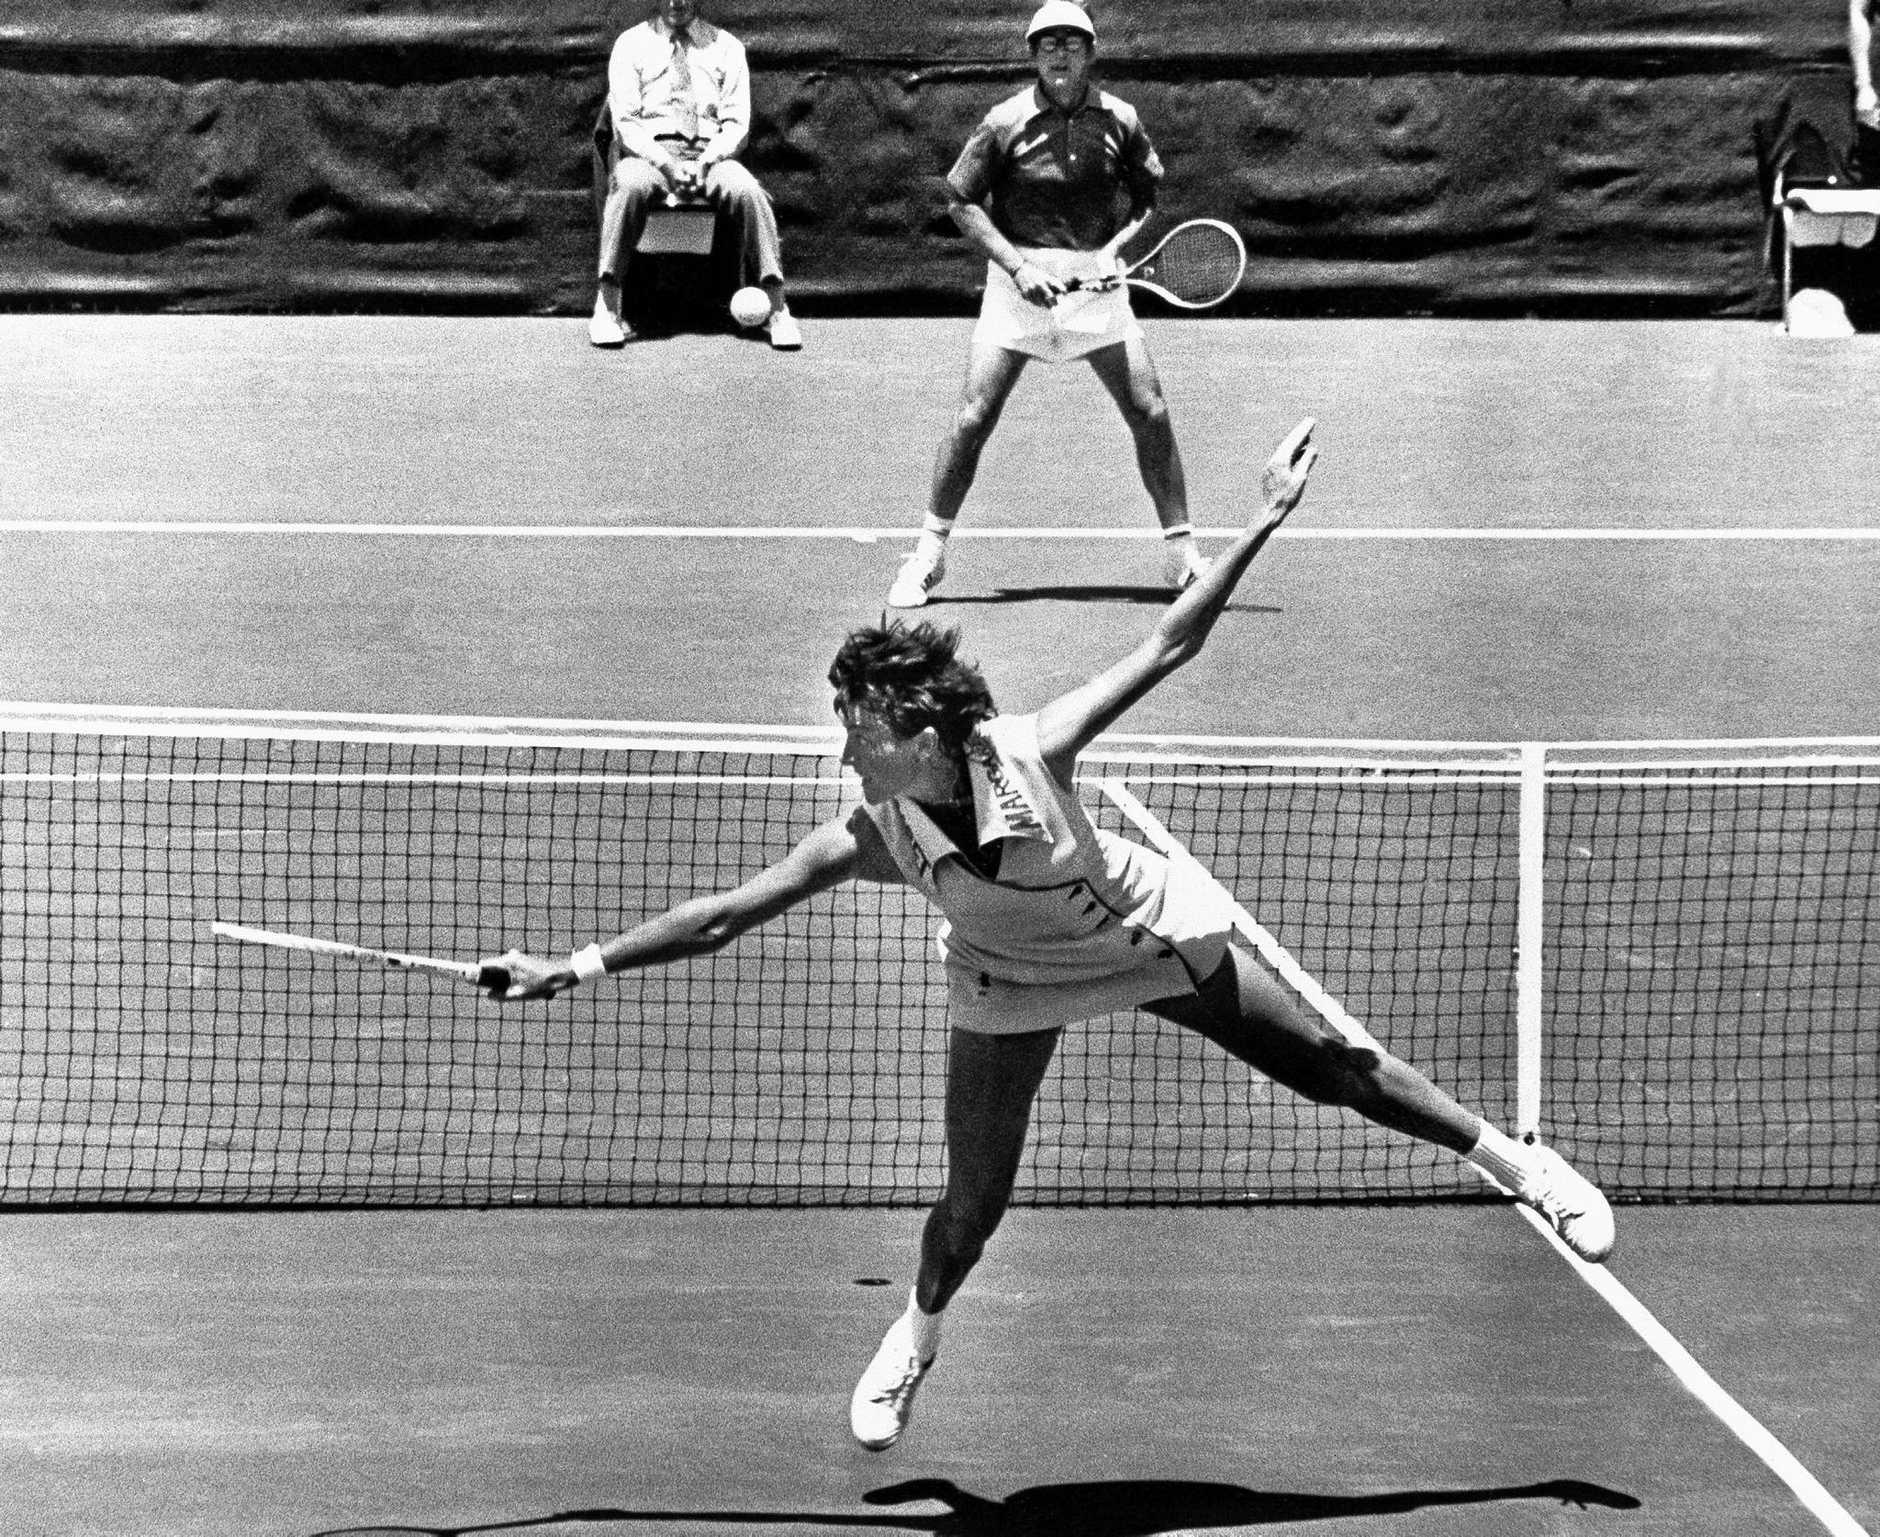 Australia's Margaret Court in action in a 1973 exhibition match.